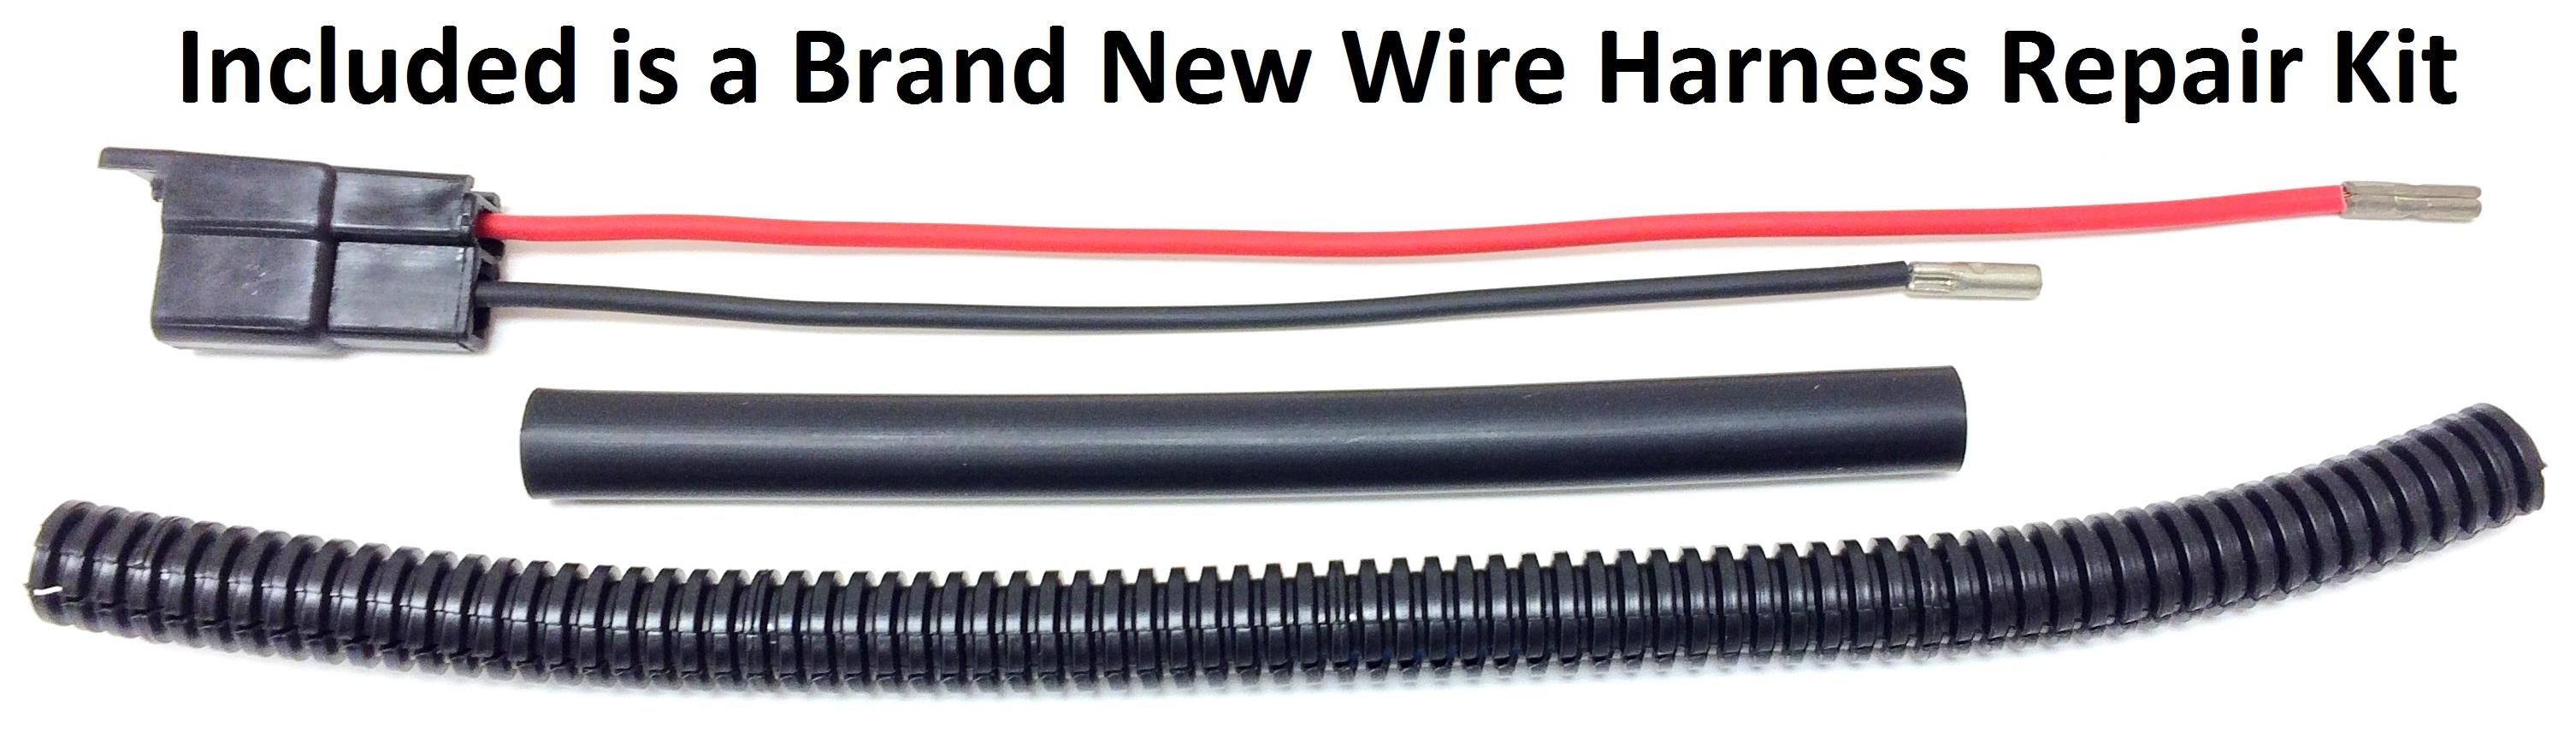 Surprising Wrg 8679 Pto Wire Harness Wiring Cloud Filiciilluminateatxorg